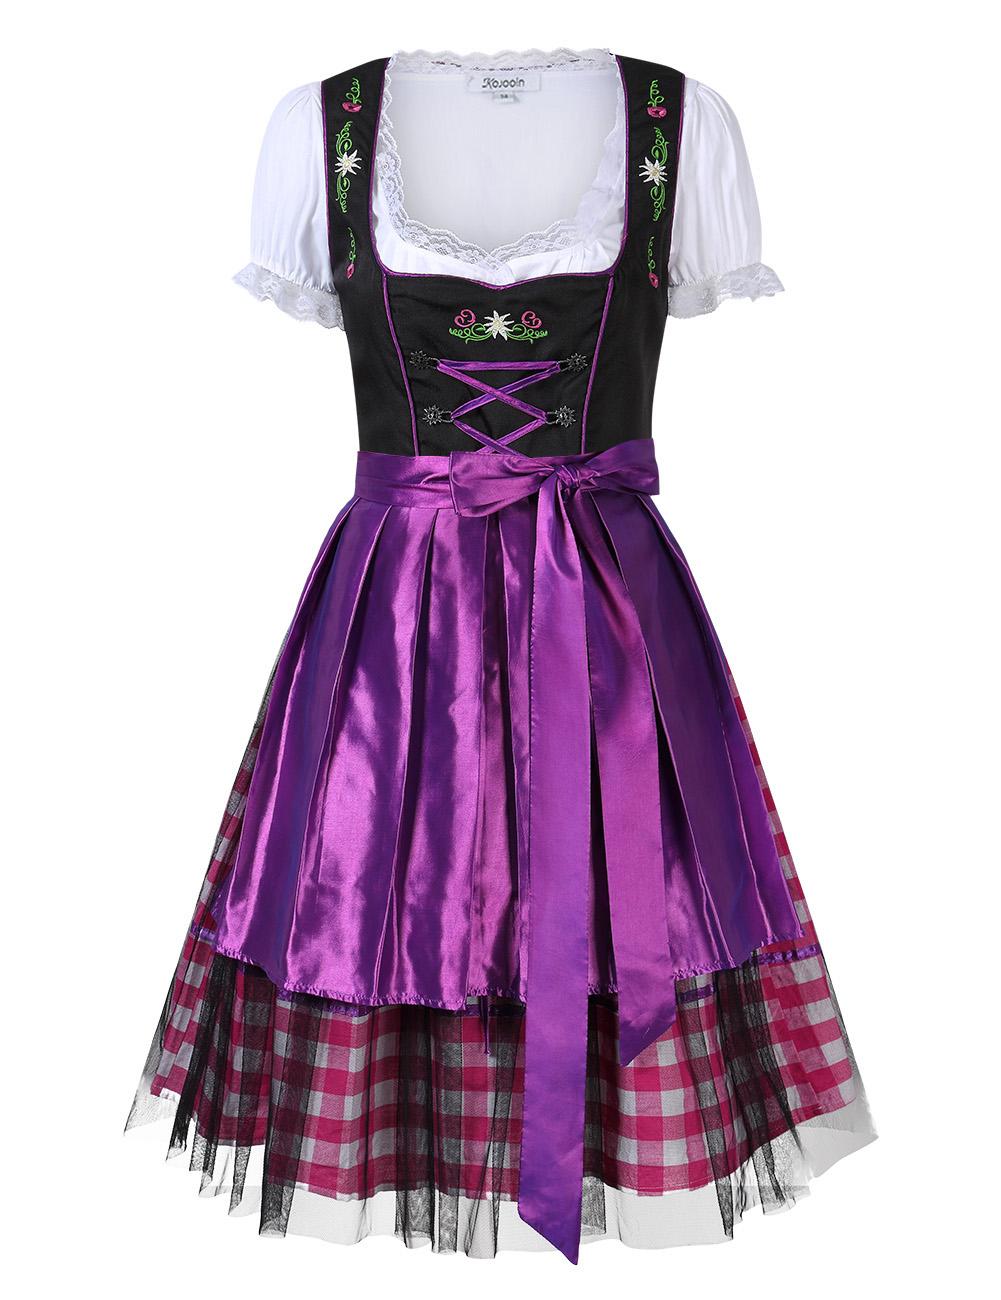 [EU Direct] Kojooin Women's Oktoberfest Plaid Mesh Stitching Embroidery A Line Formal Dresses Suit